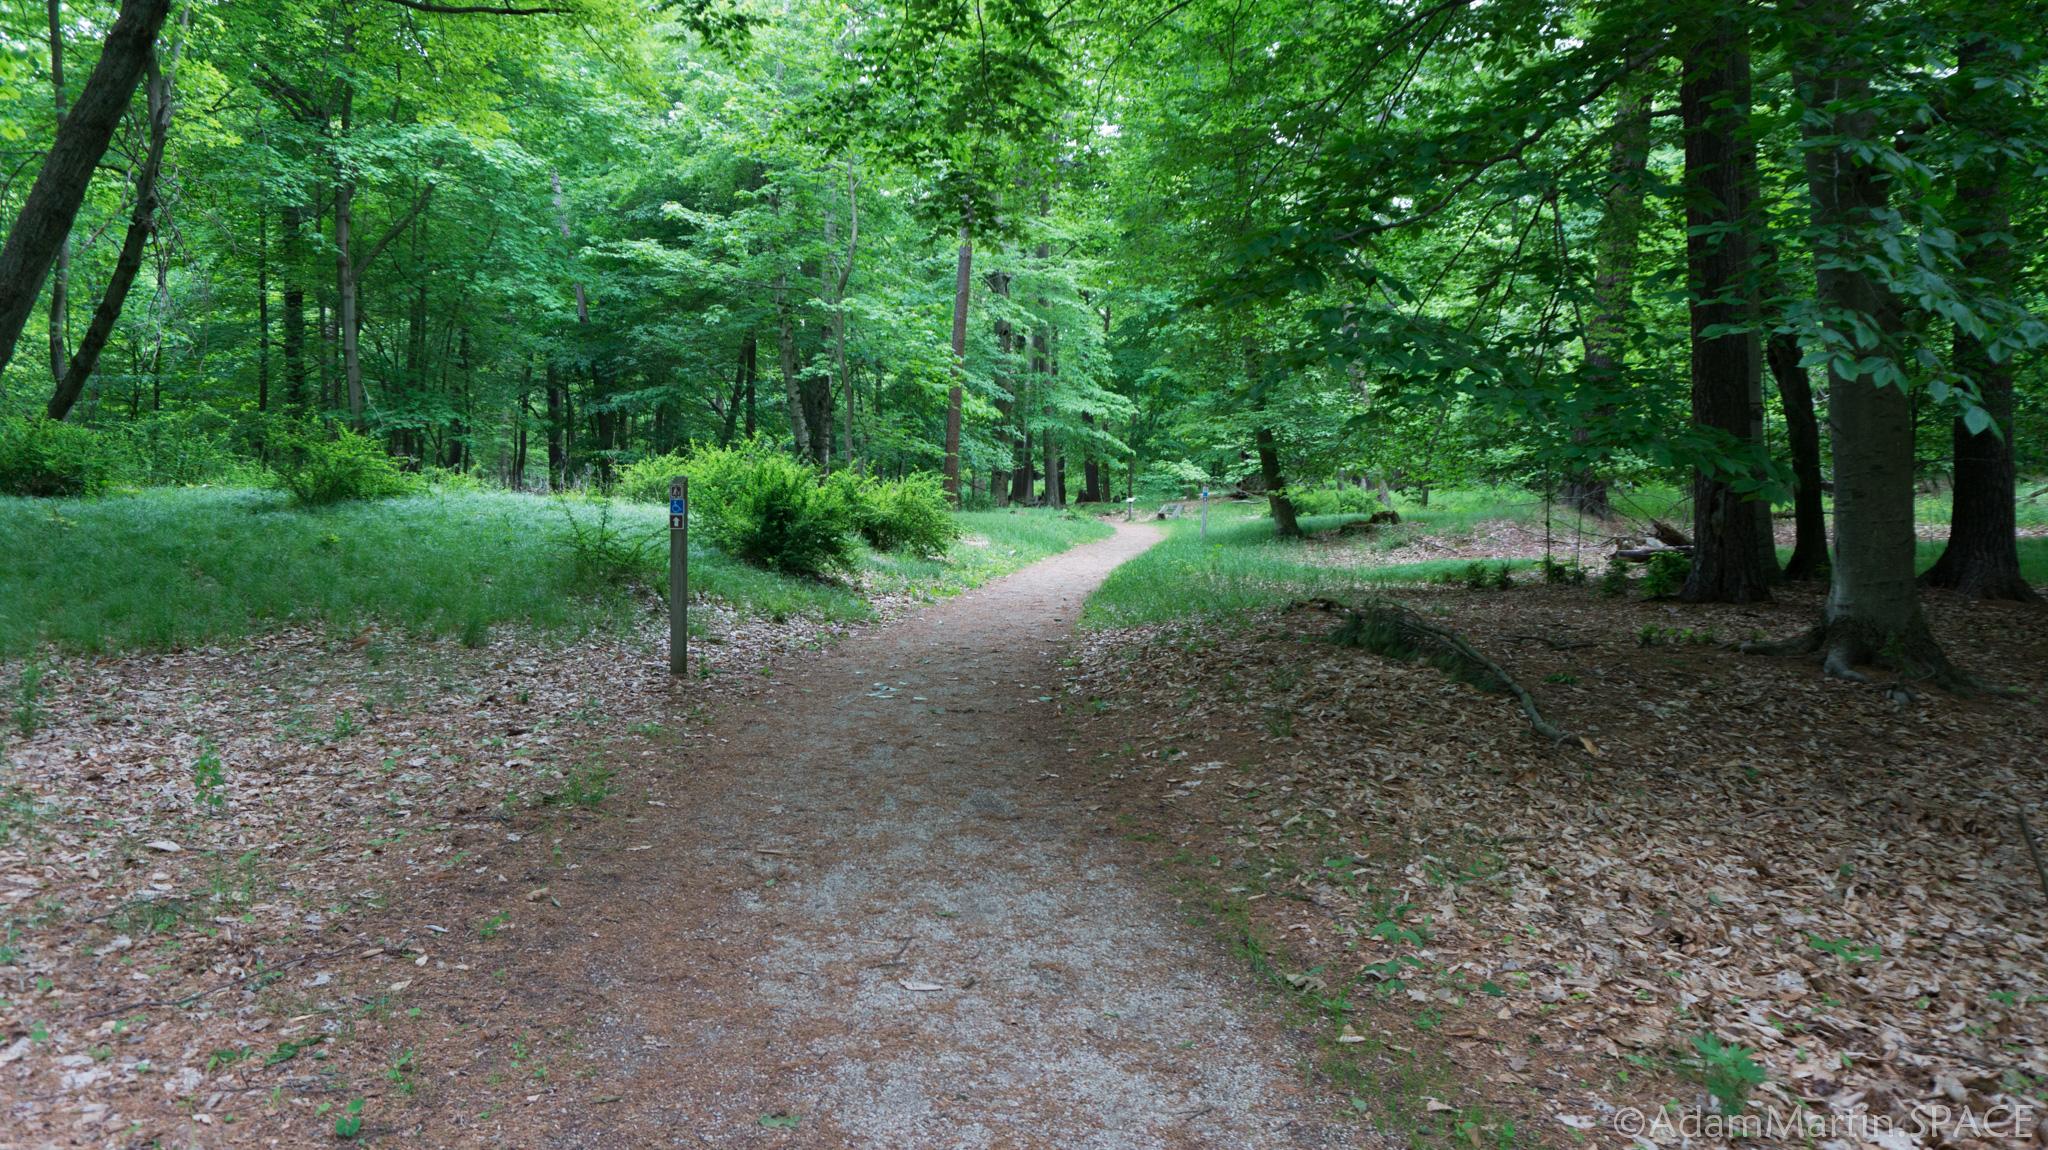 Woodland Dunes Trail At Kohler Andrae >> Kohler Andrae State Park Adammartin Space